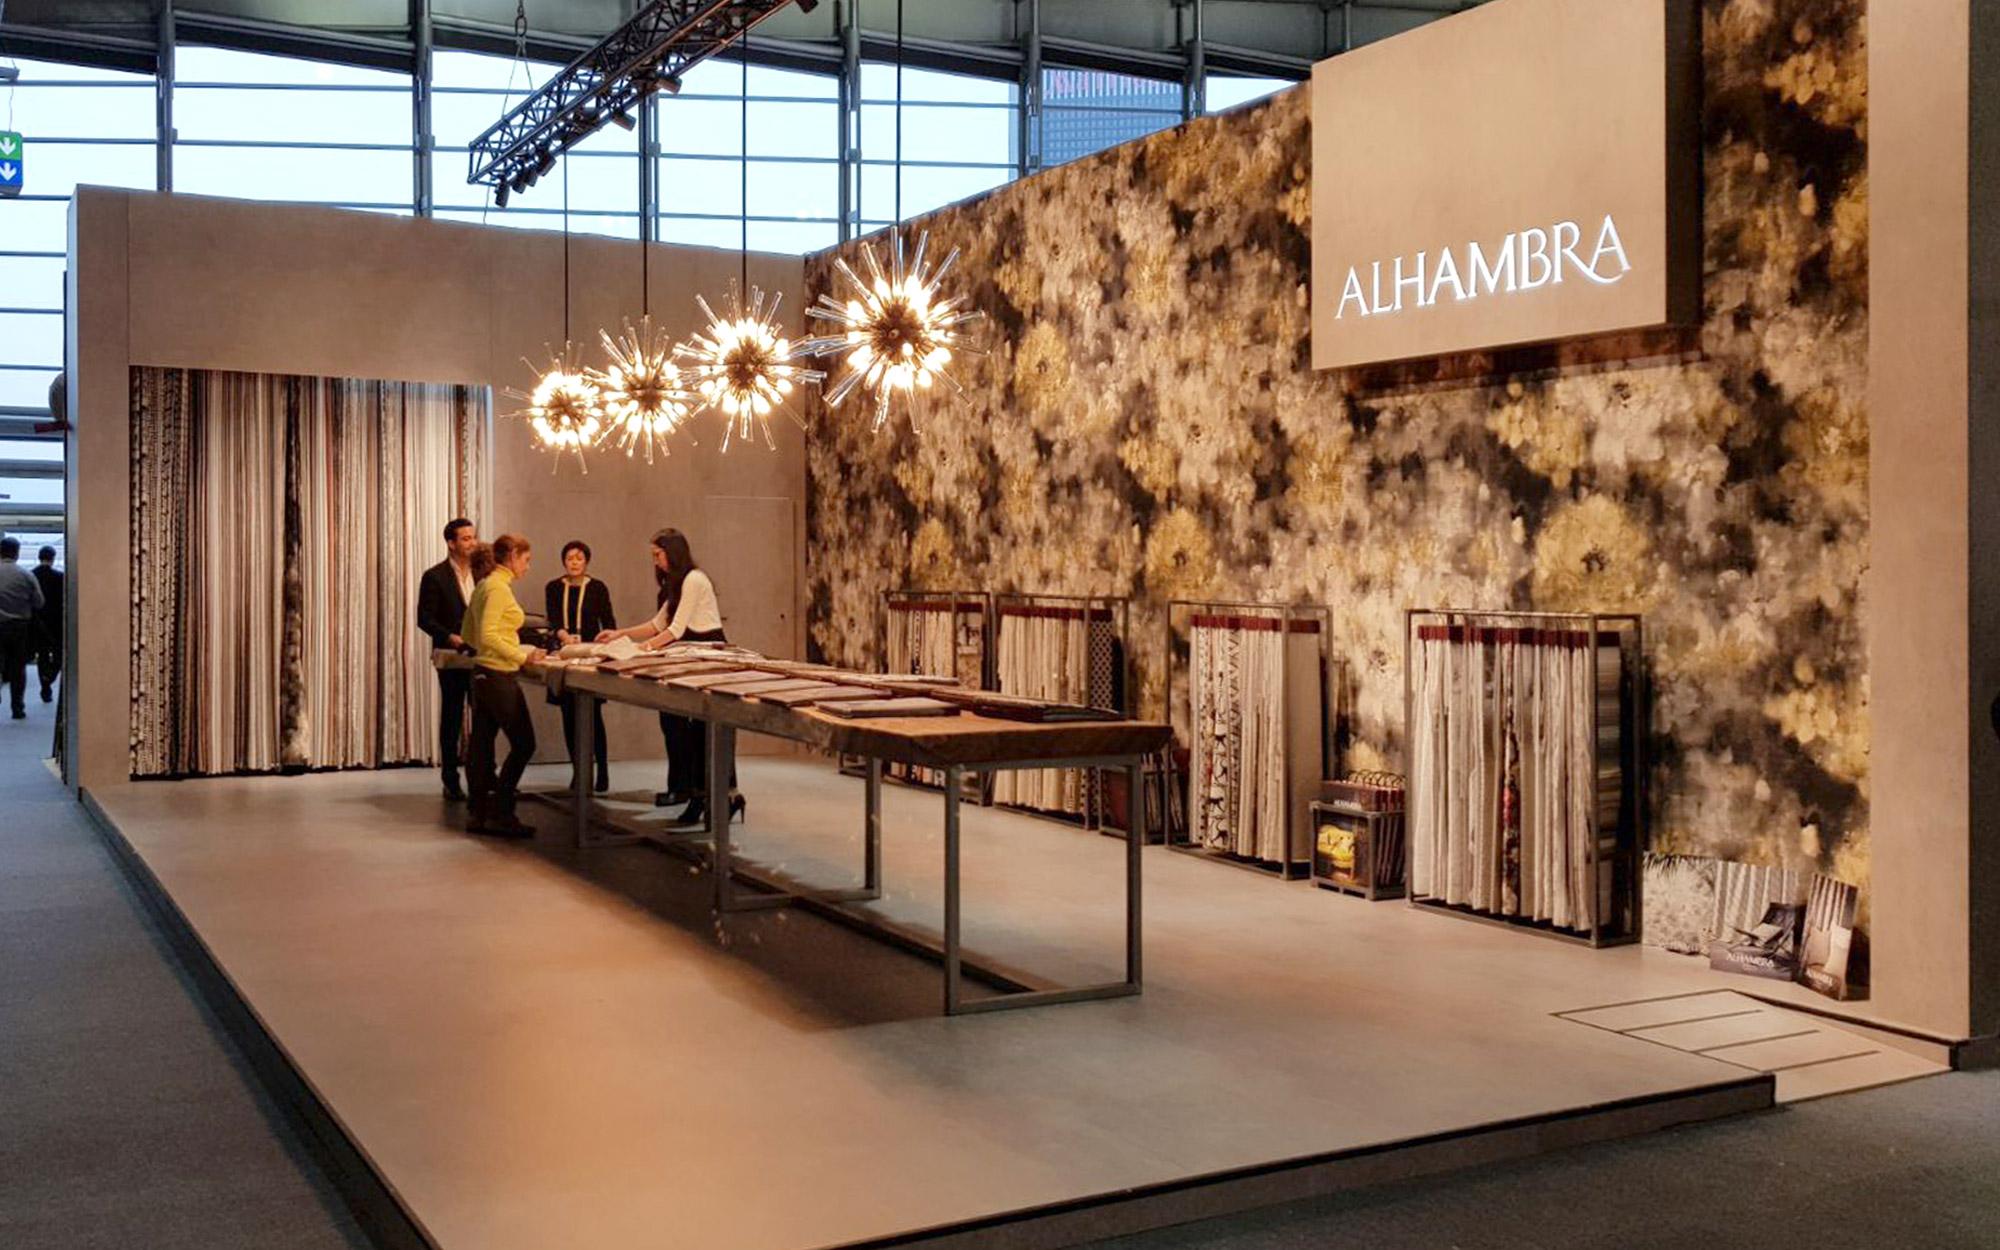 stand-Alhambra-Internacional-01-©pepgram